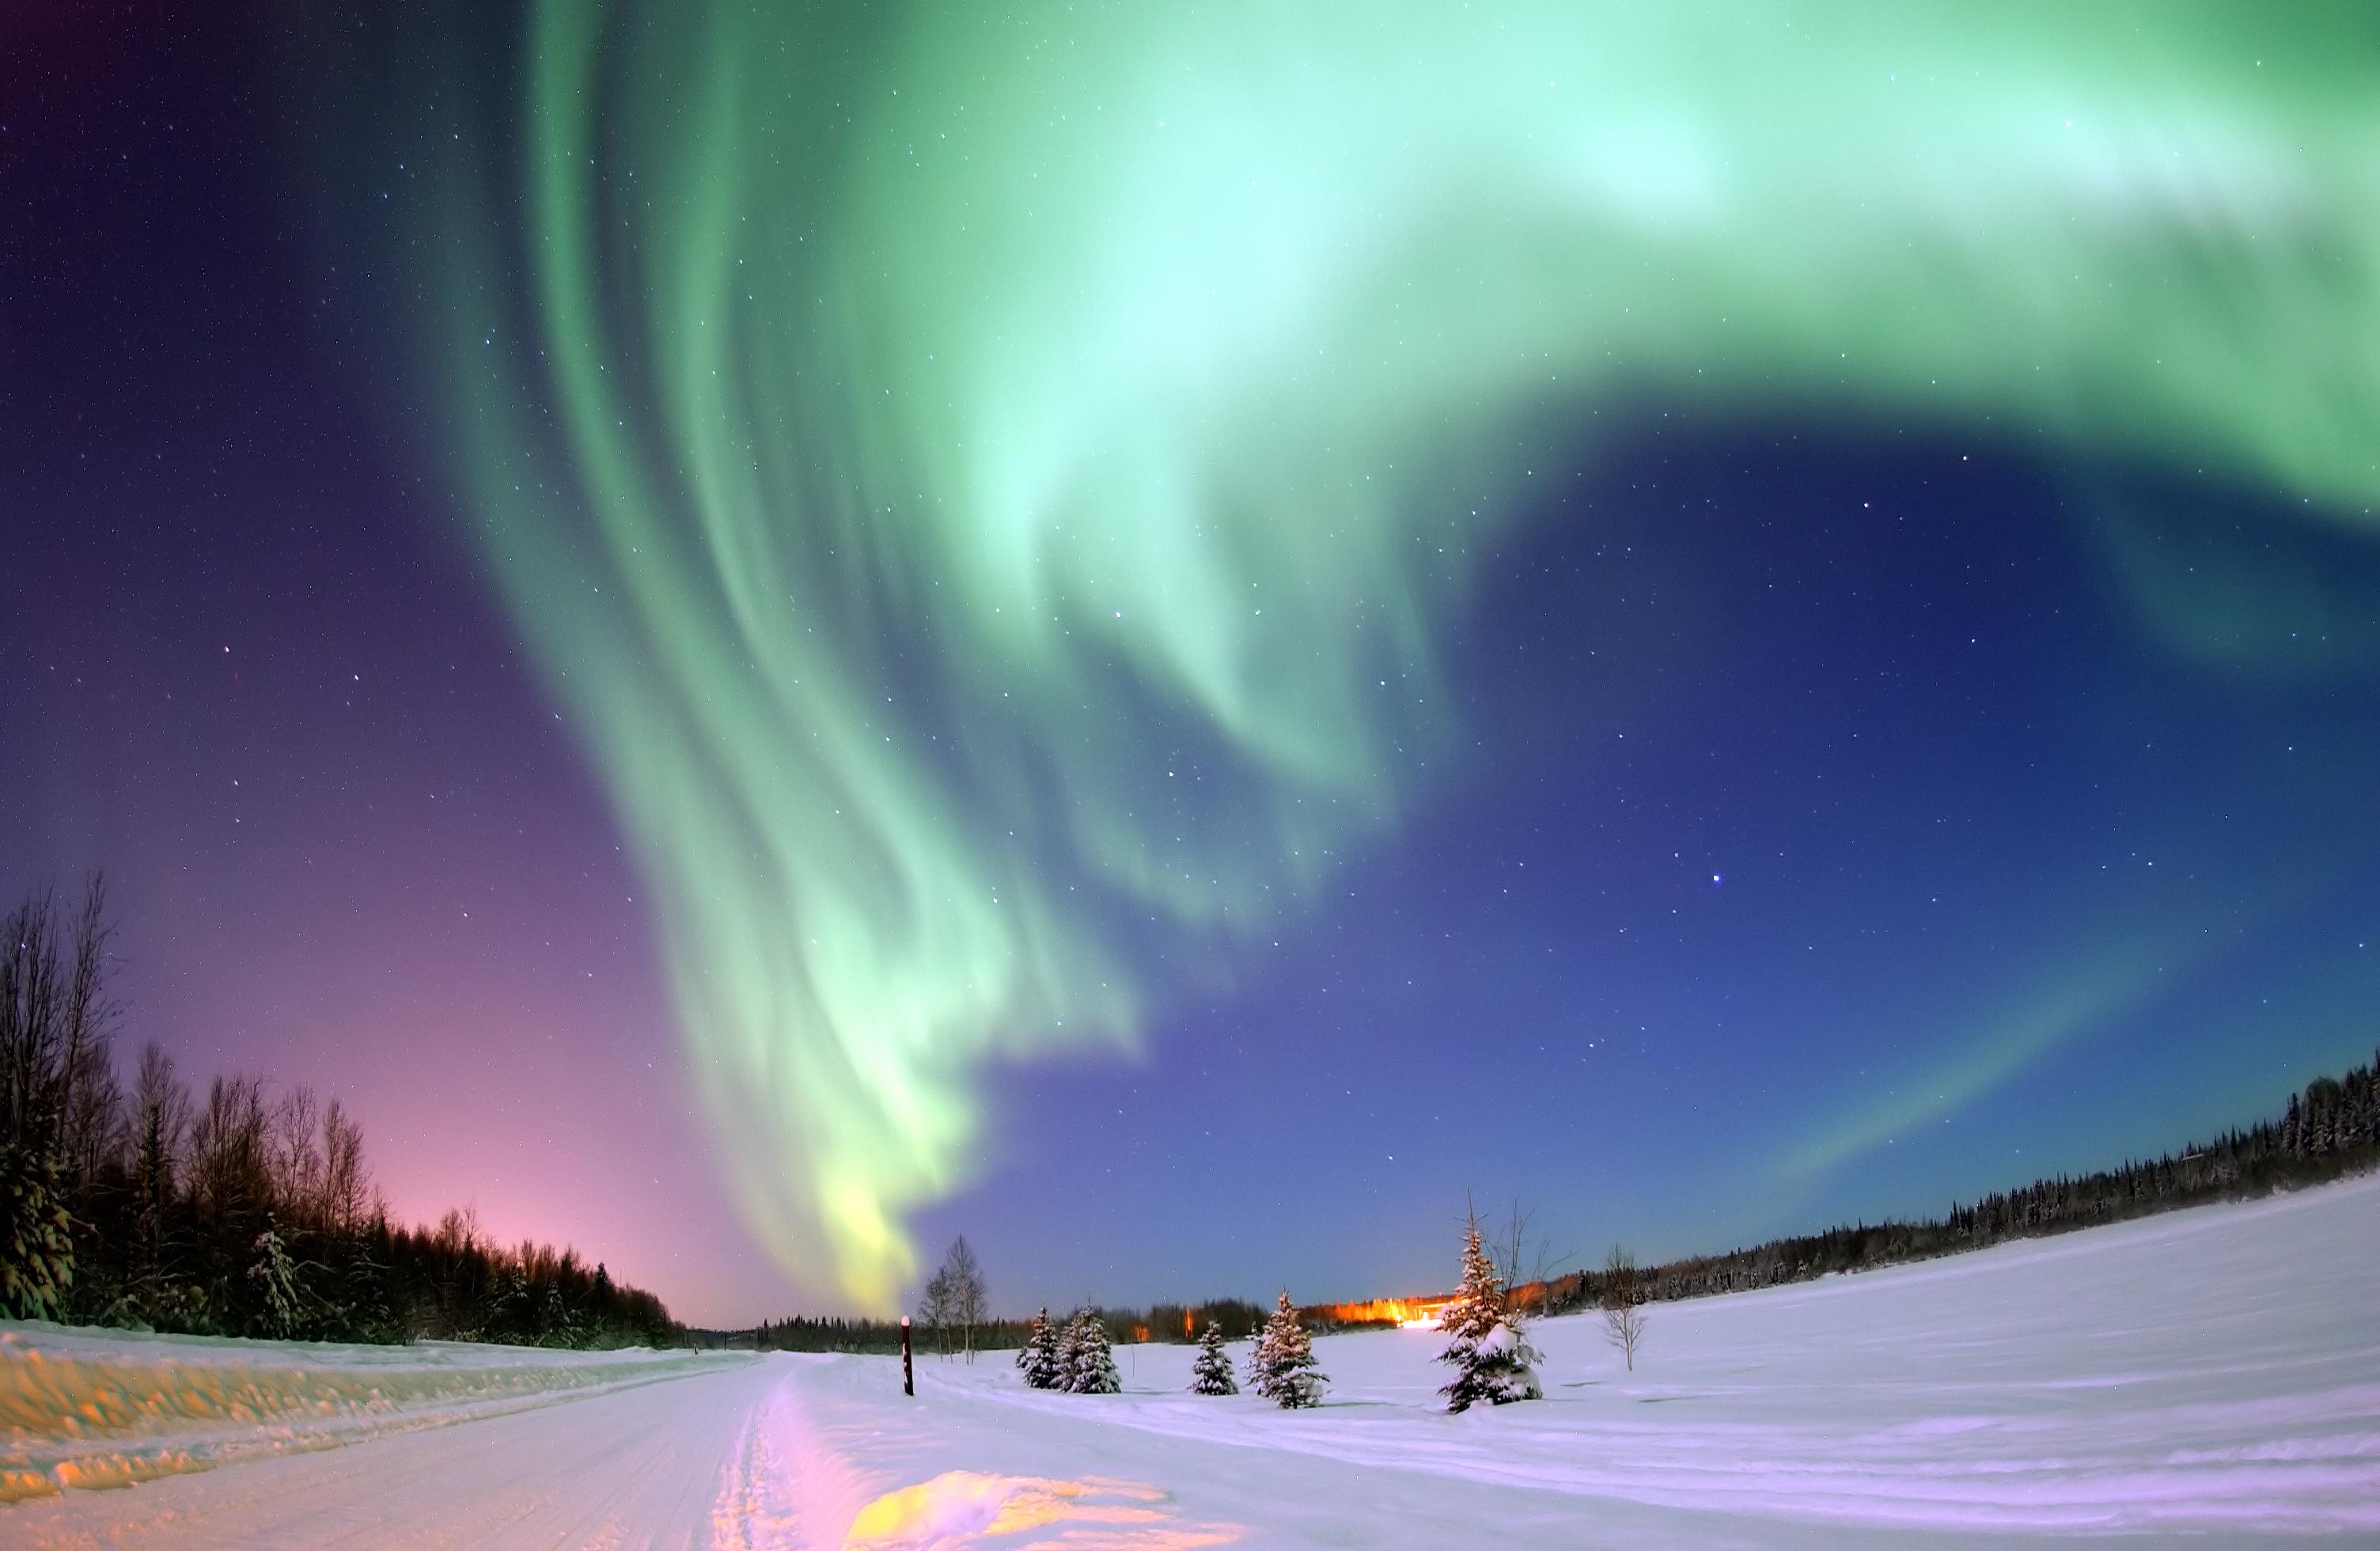 Depiction of Aurora polar